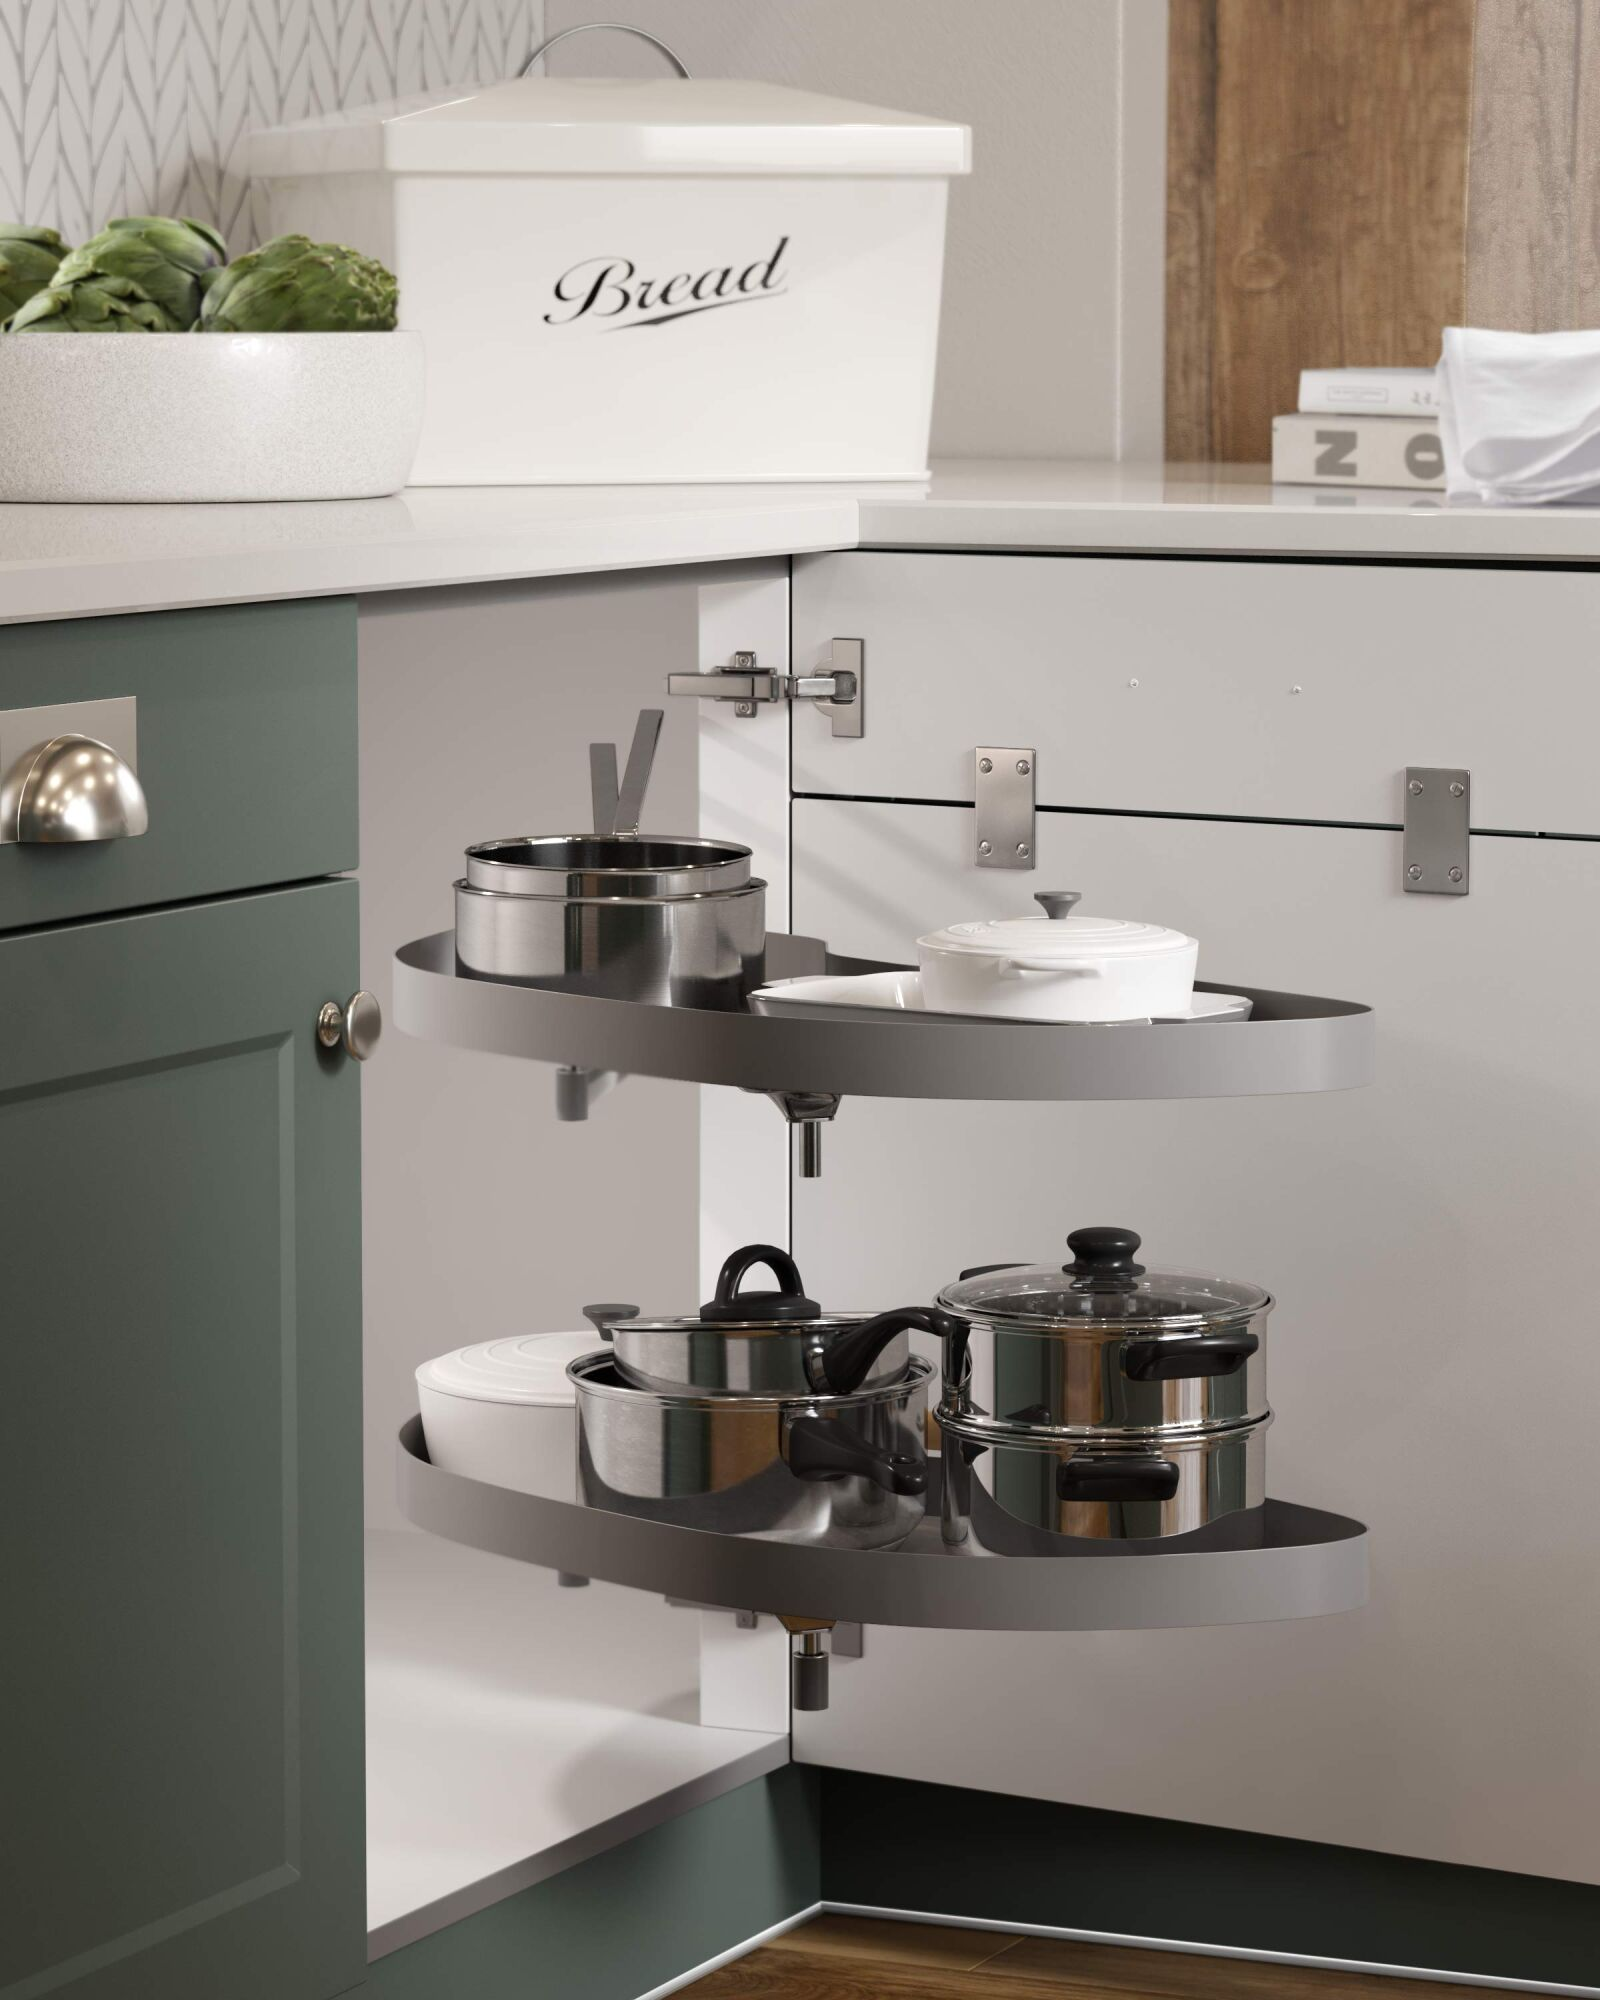 Shaker Chelsea Juratek Kitchen in Forest Green